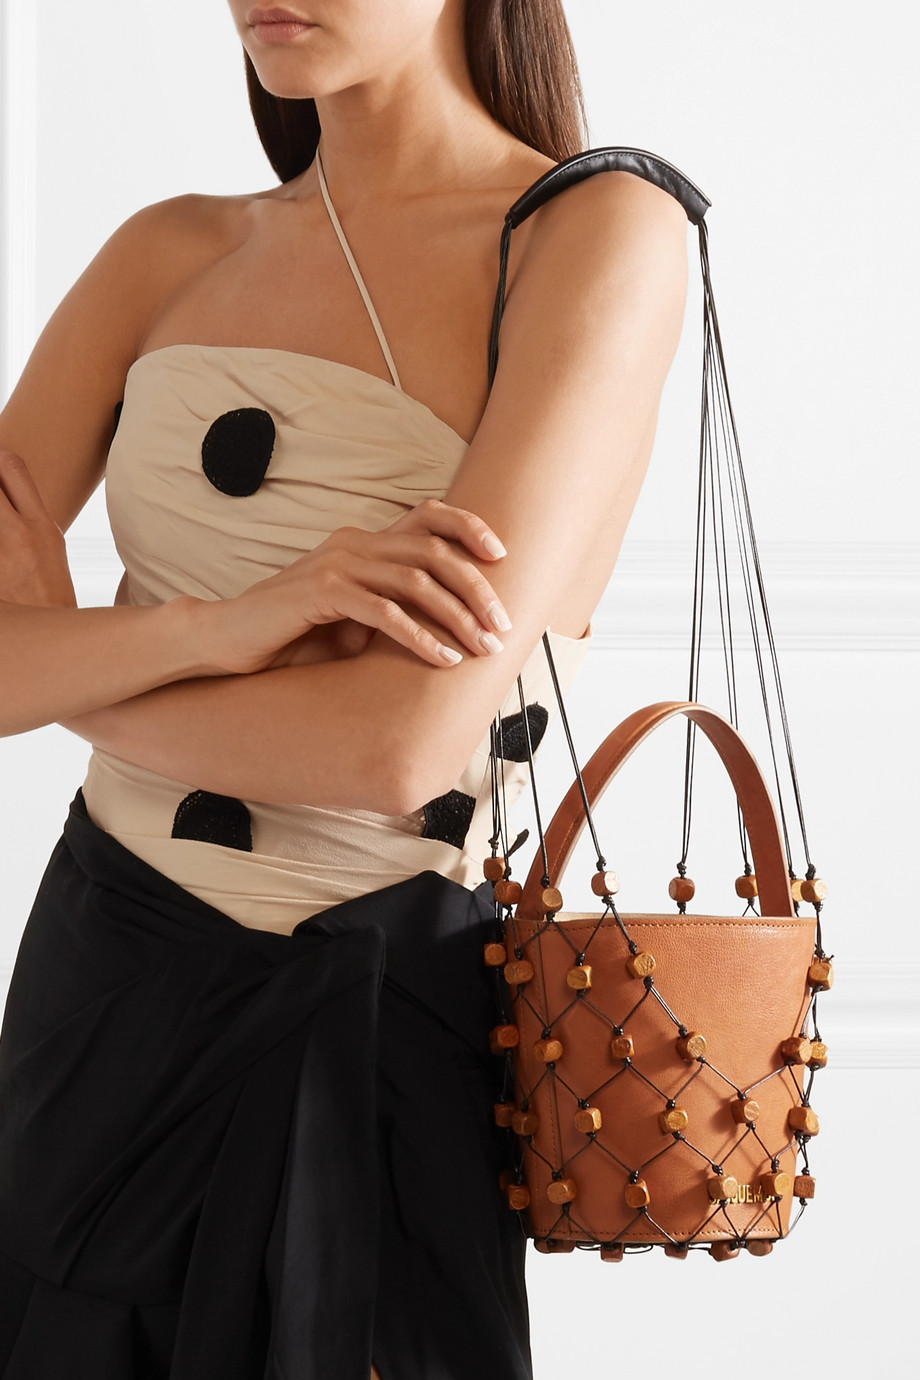 Jacquemus Maracasau convertible leather and macramé shoulder bag $621